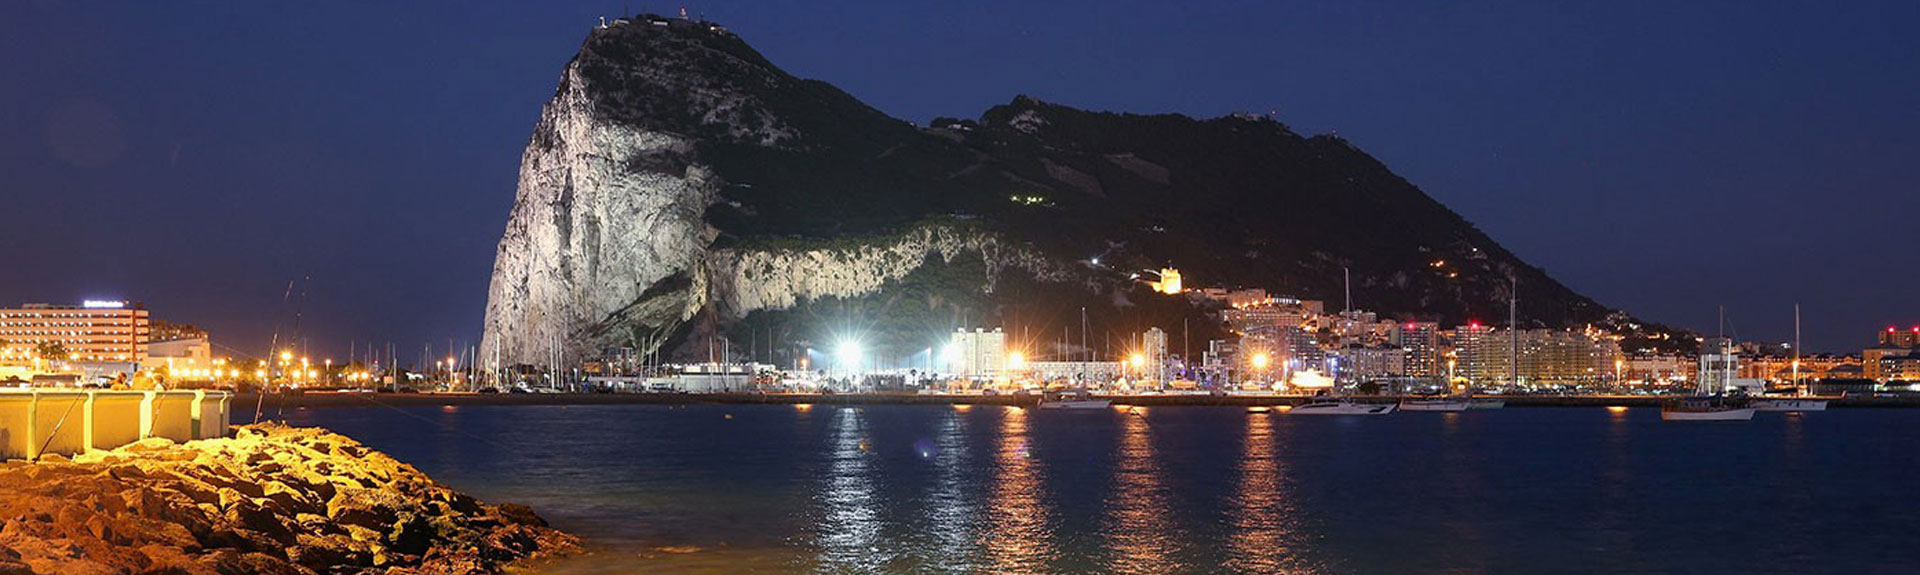 1400-hero-gibraltar-rock-night.imgcache.rev1409669038227.web.1400.720